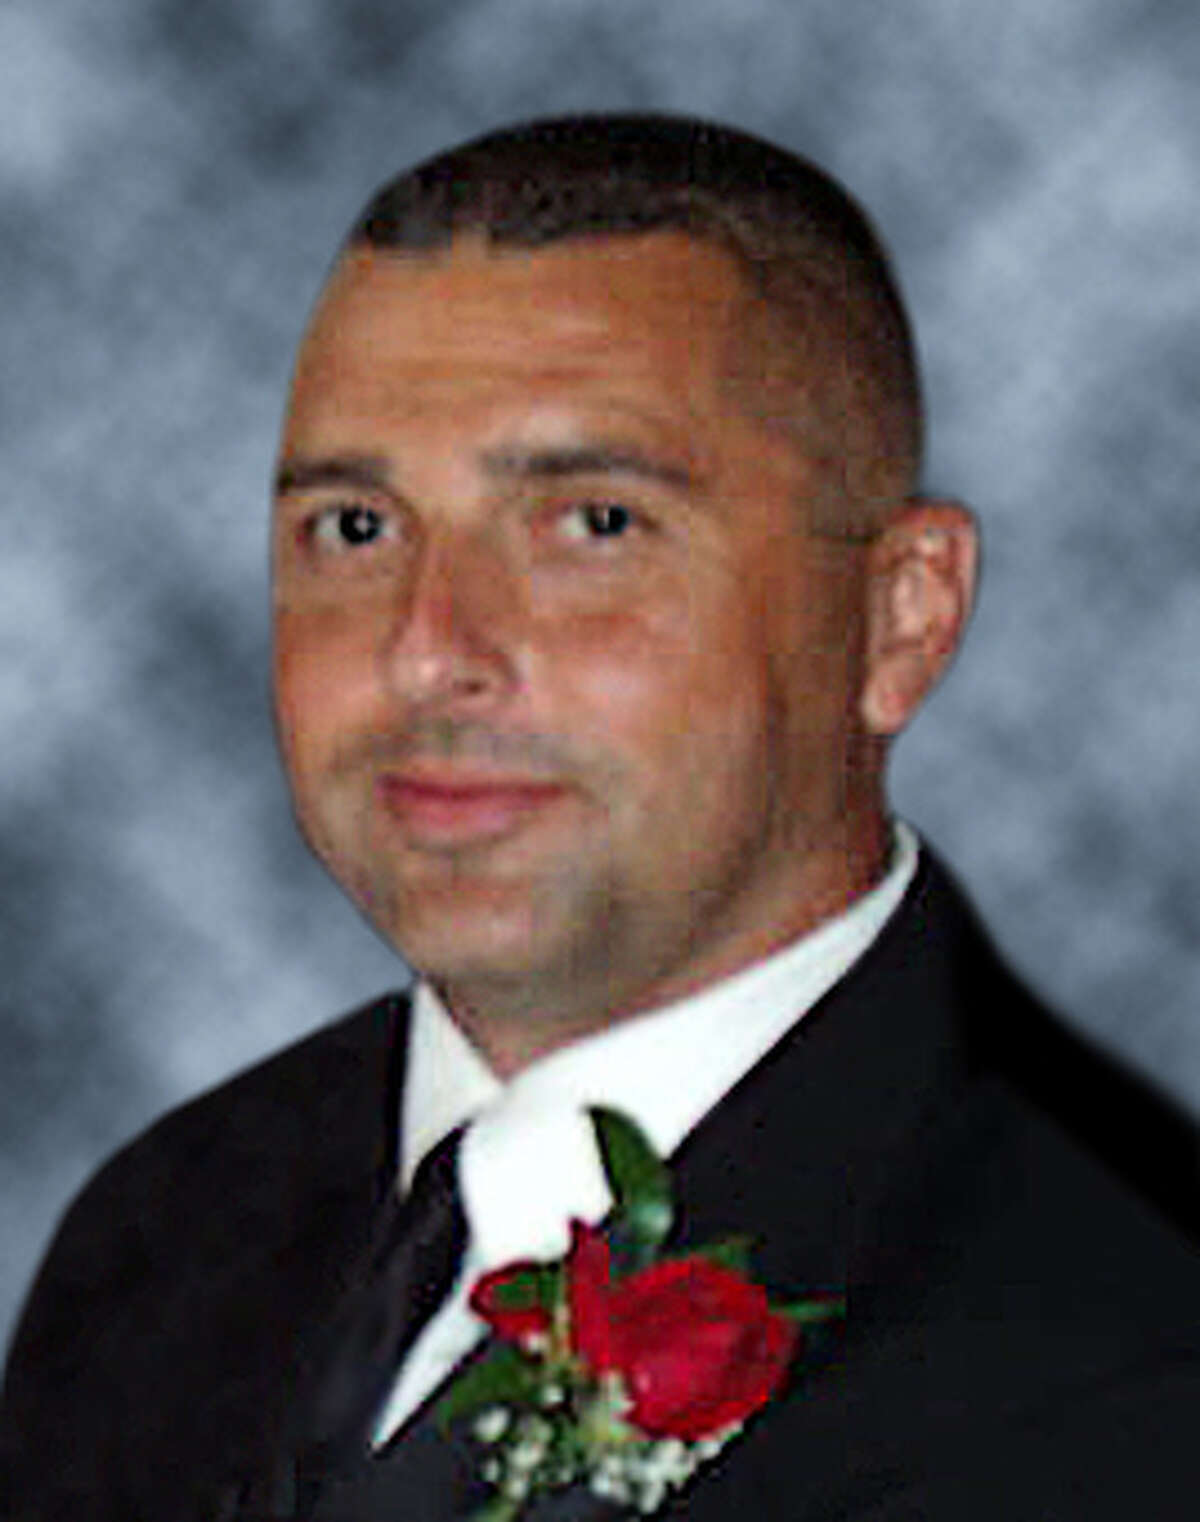 Bridgeport Fire Department Lt. Steven Velasquez. Velasquez died while fighting a fire at 41 Elmwood Ave on Saturday, July 24, 2010.